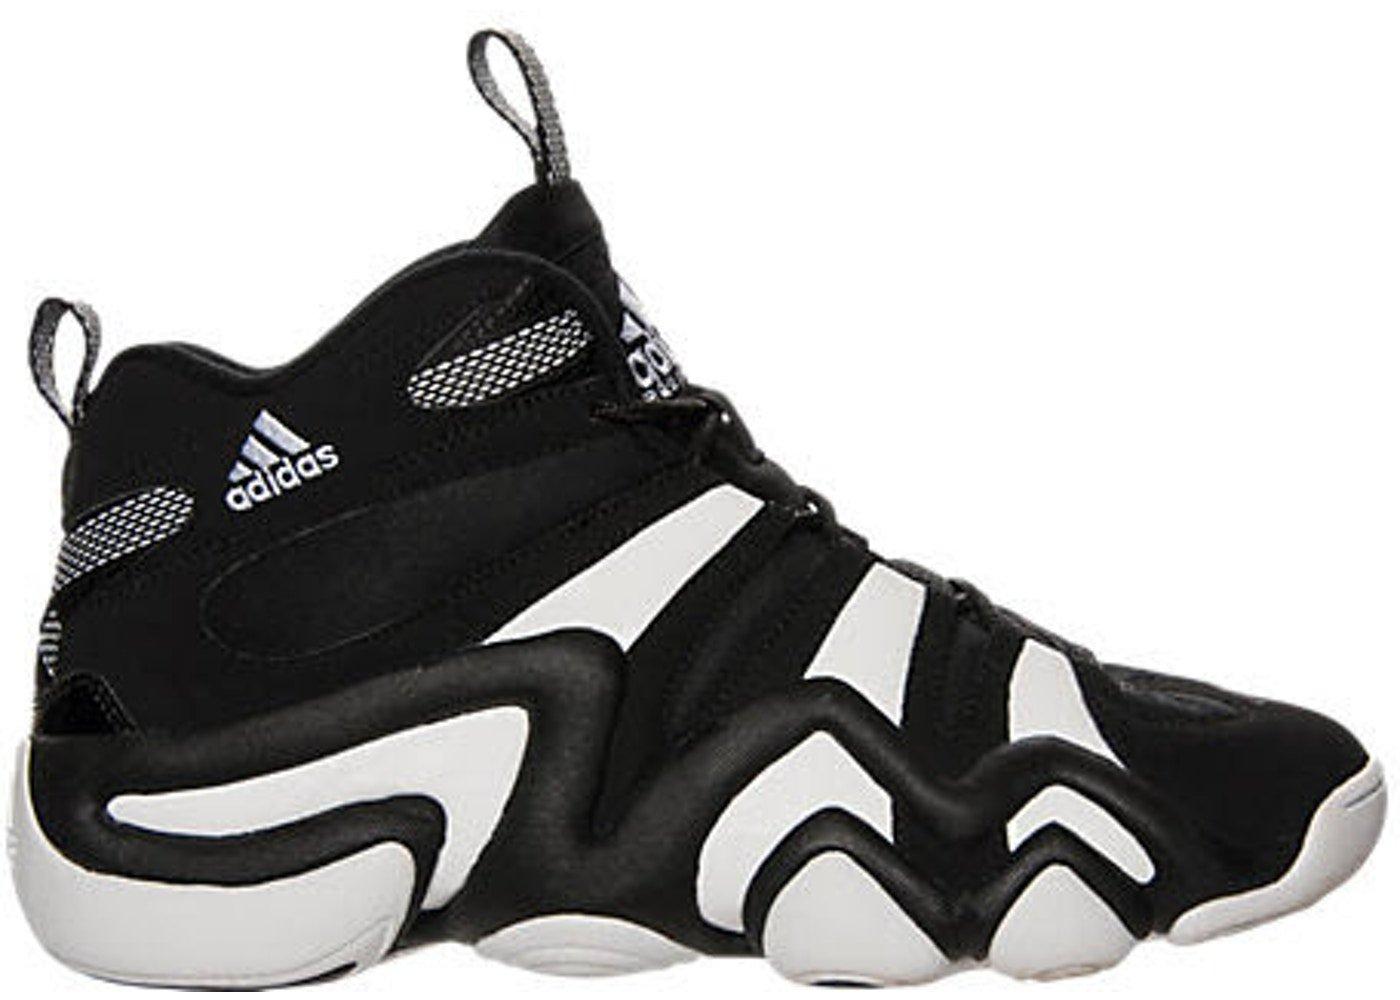 What Pros Wear Kobe Bryant\u0027s adidas KB8 / adidas Crazy 8